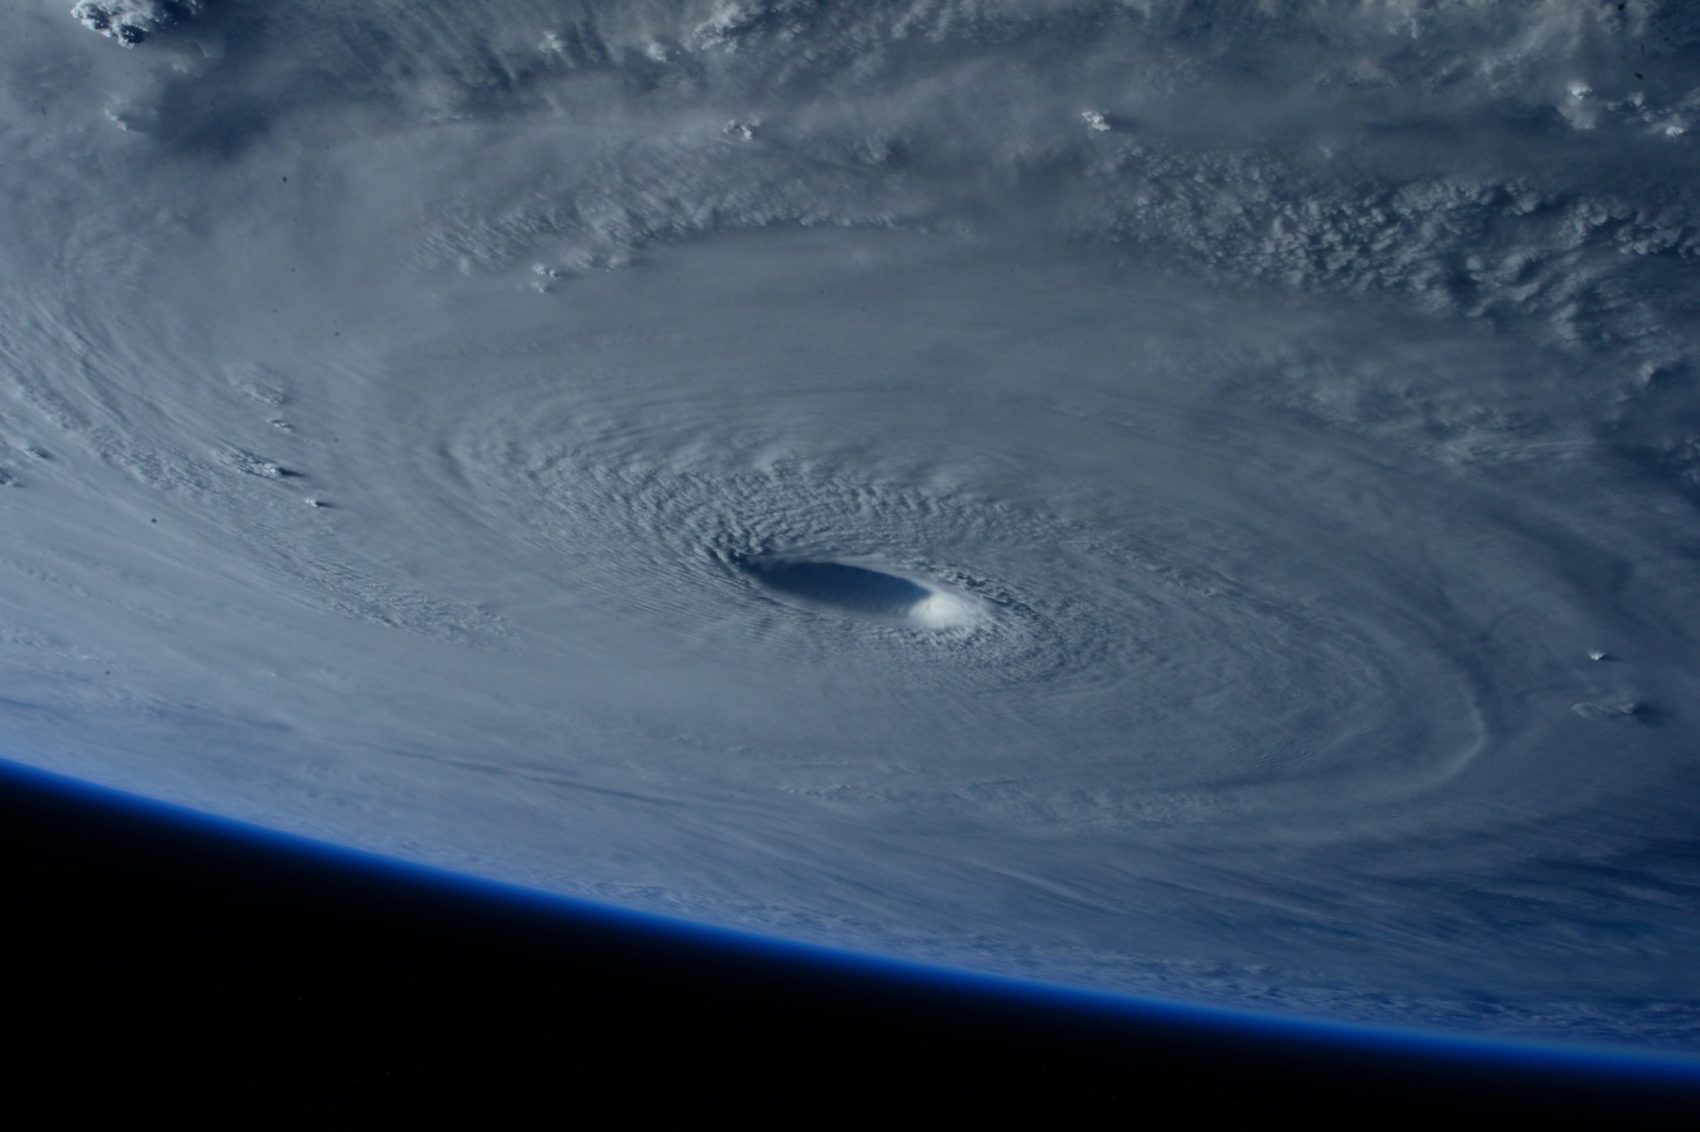 hurricanes get named